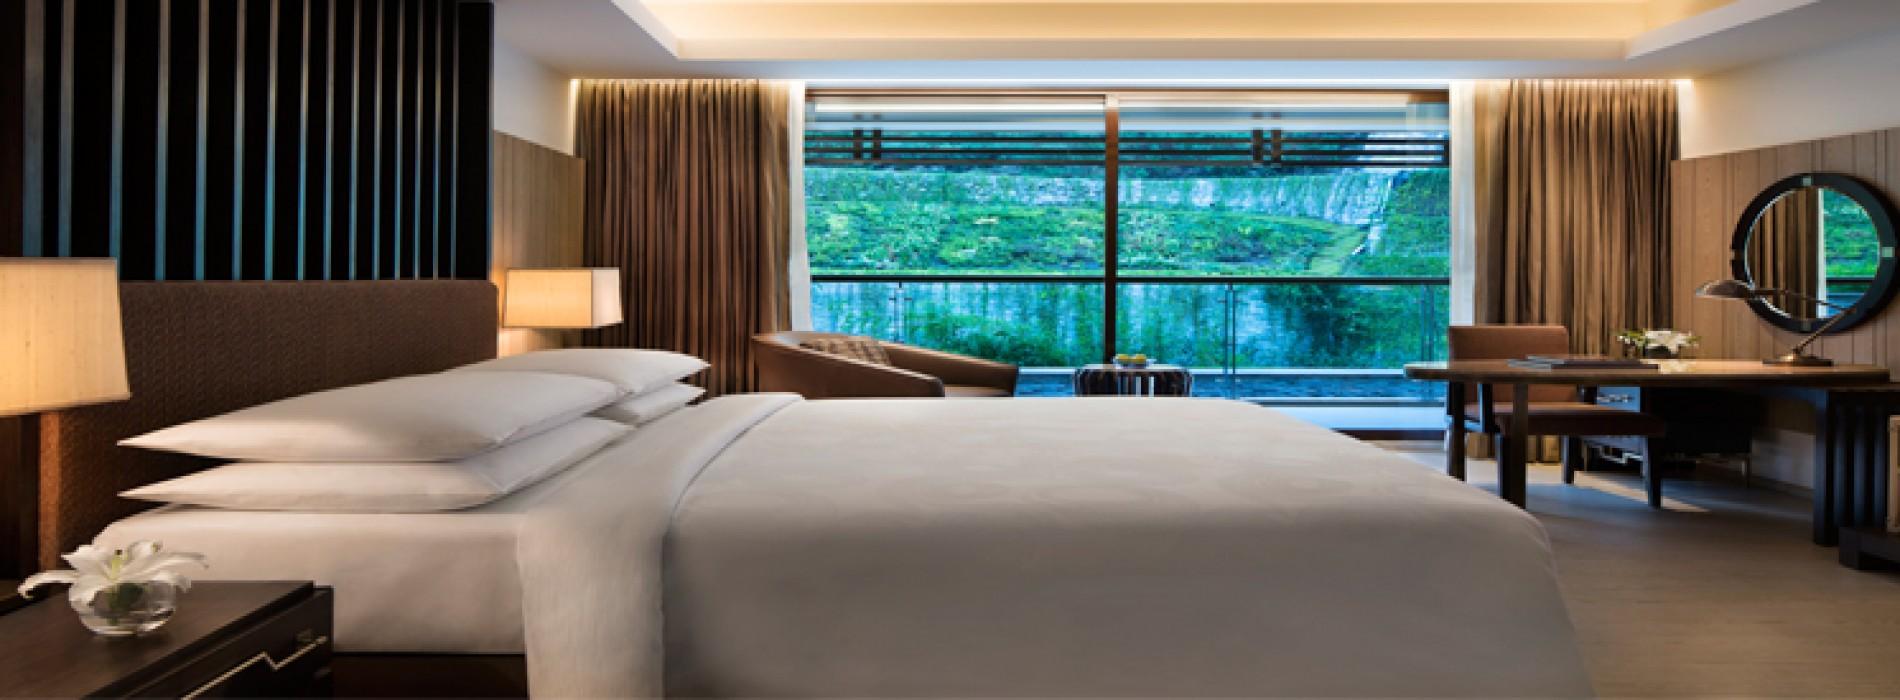 JW Marriott Mussoorie Walnut Grove Resort & Spa unveils exciting summer packages